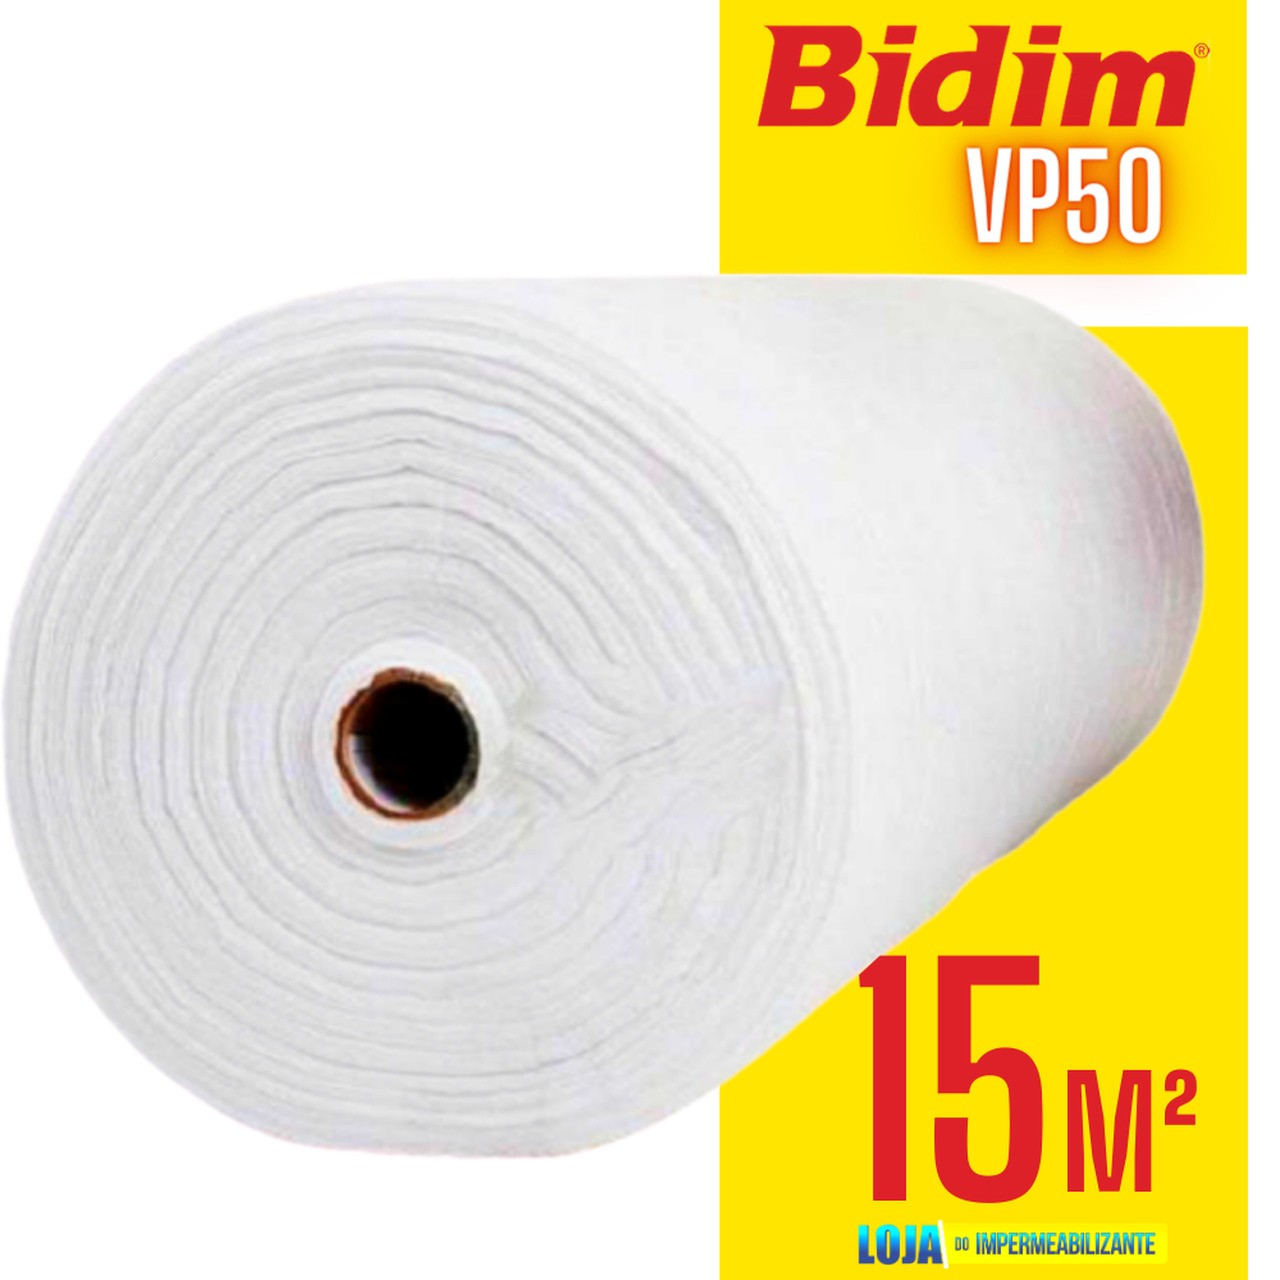 15m2 Manta Bidim Vp50 Impermeabilizante p/ Telhados Lajes Telhas